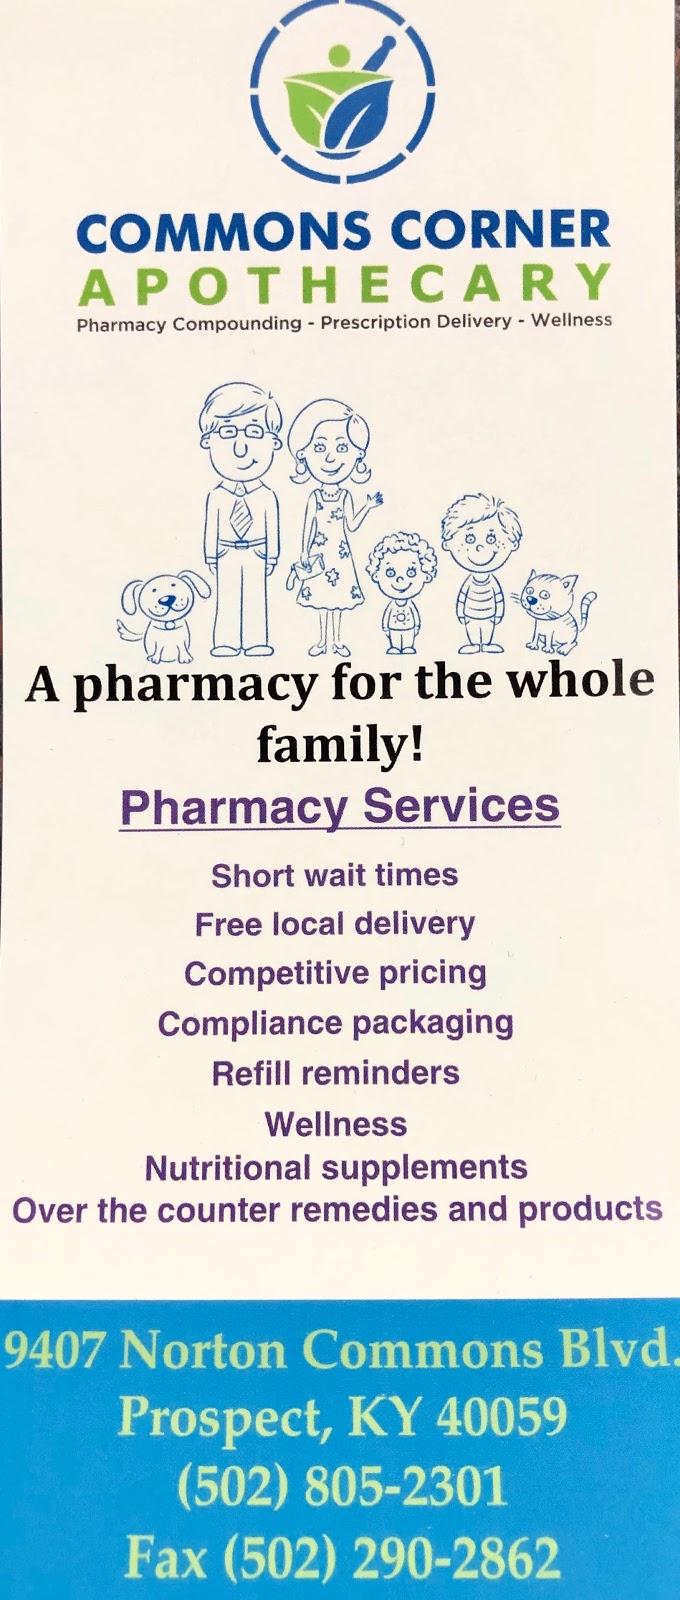 Commons Corner Apothecary - pharmacy  | Photo 4 of 6 | Address: 9407 Norton Commons Blvd, Prospect, KY 40059, USA | Phone: (502) 805-2301